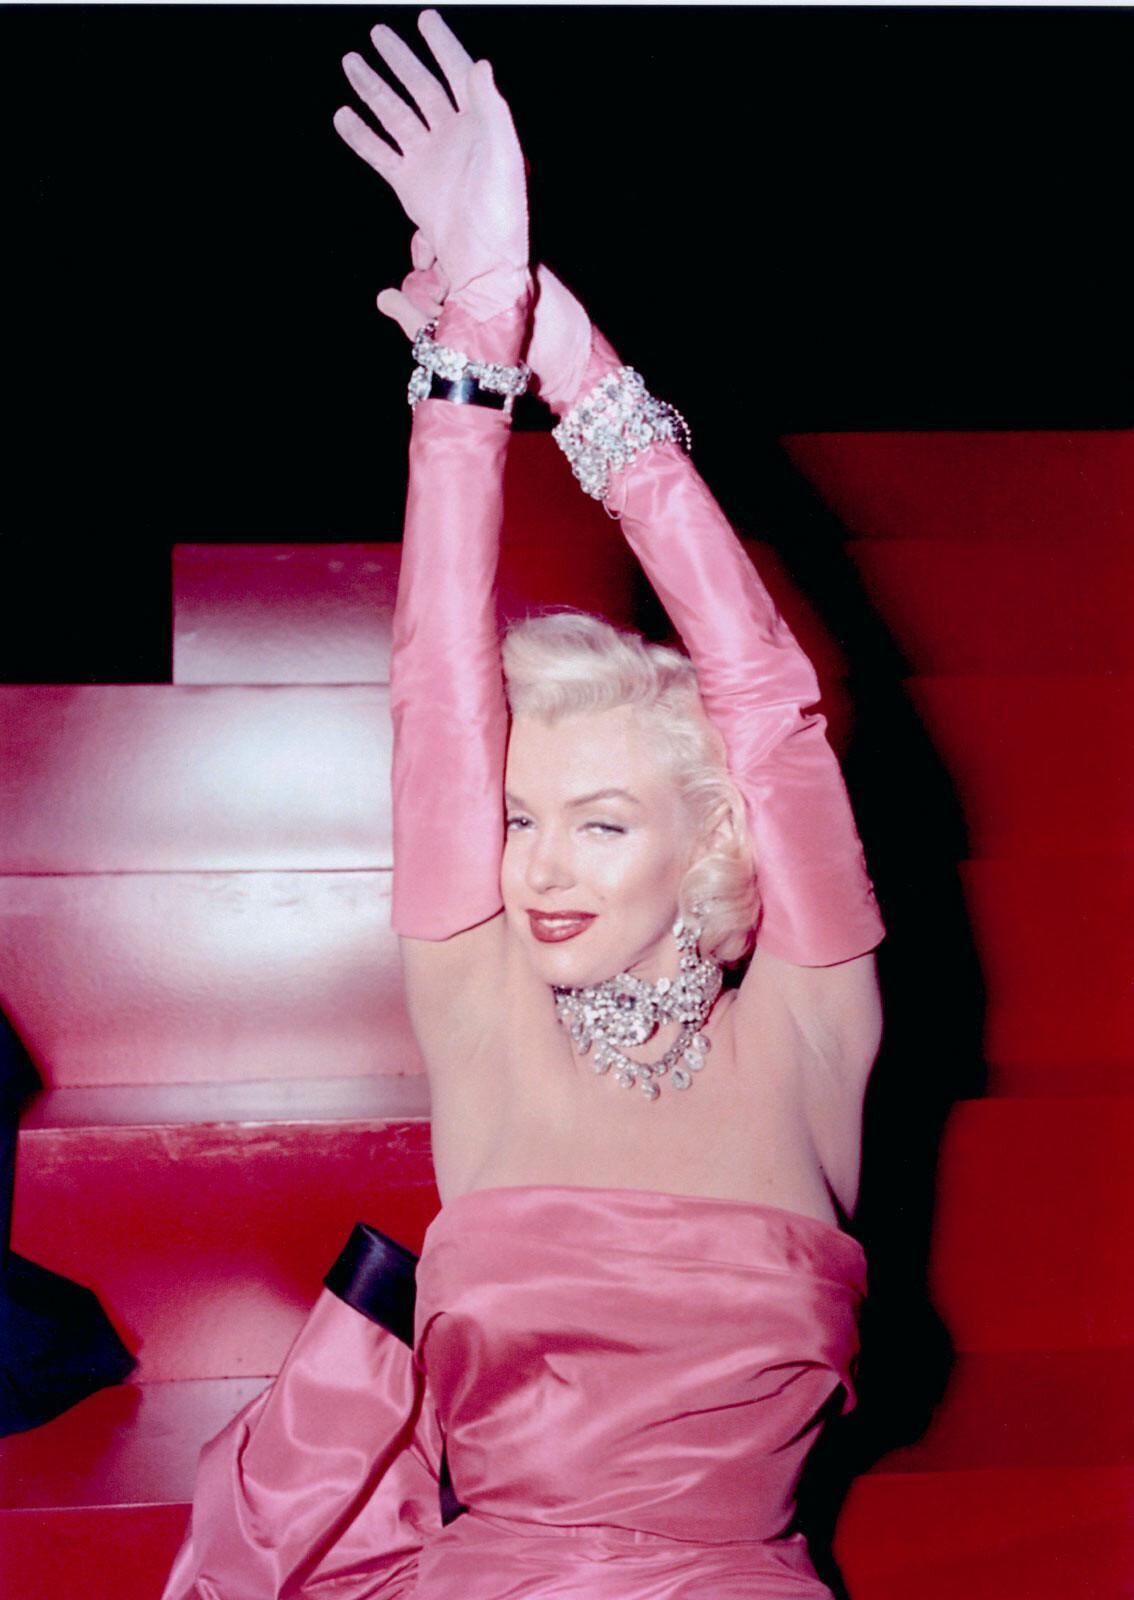 Lorelei Lee (Marilyn Monroe)  - Howard Hawks